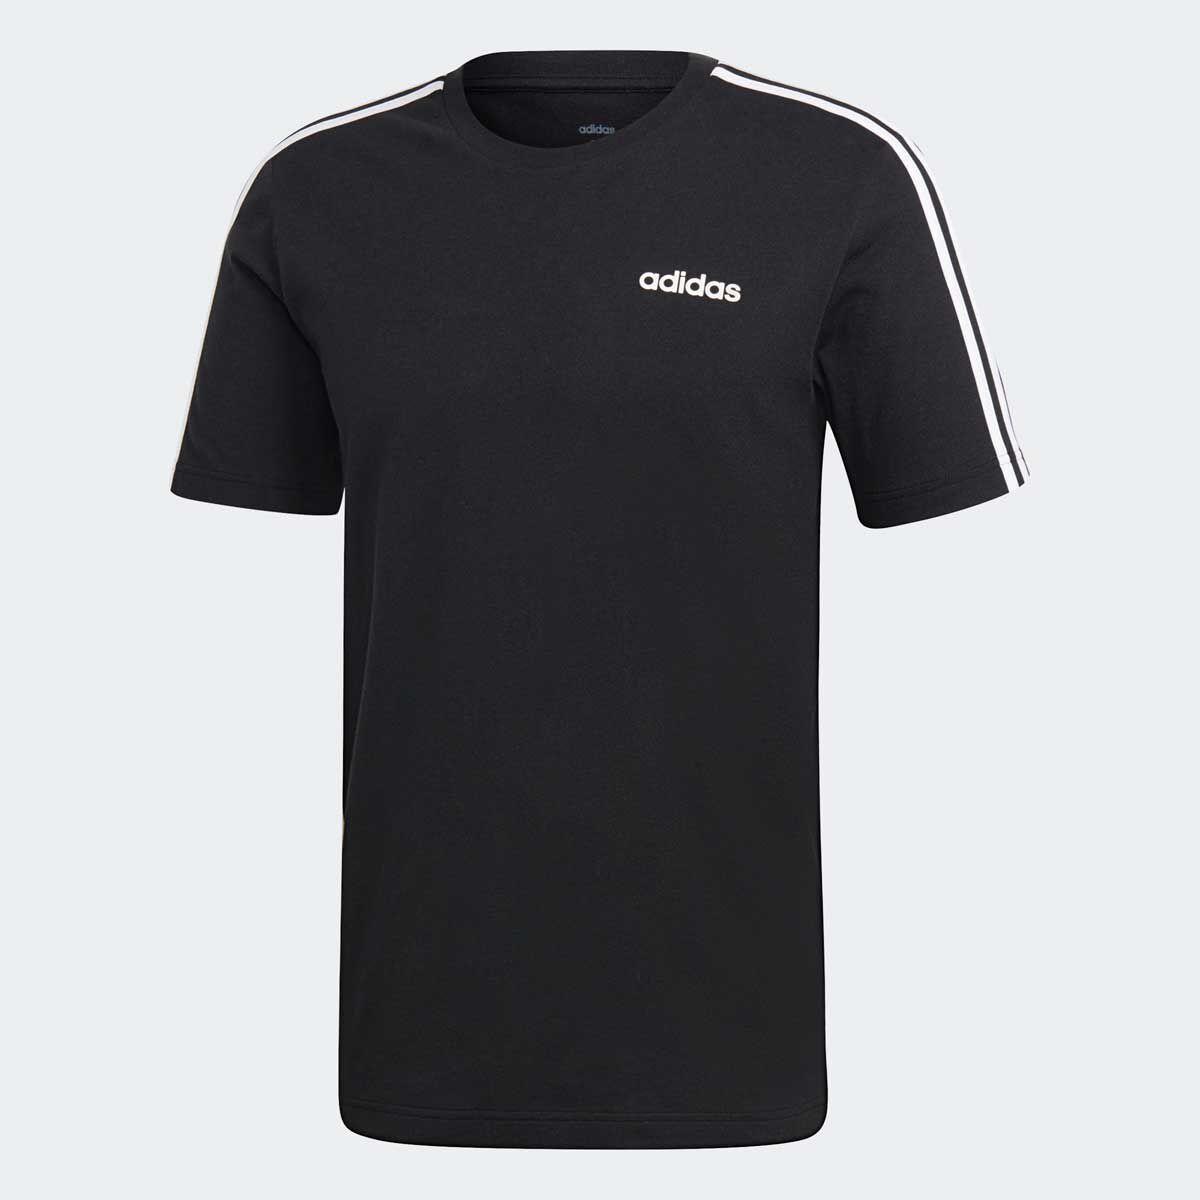 adidas Mens Essentials 3 Stripes Tee Black M